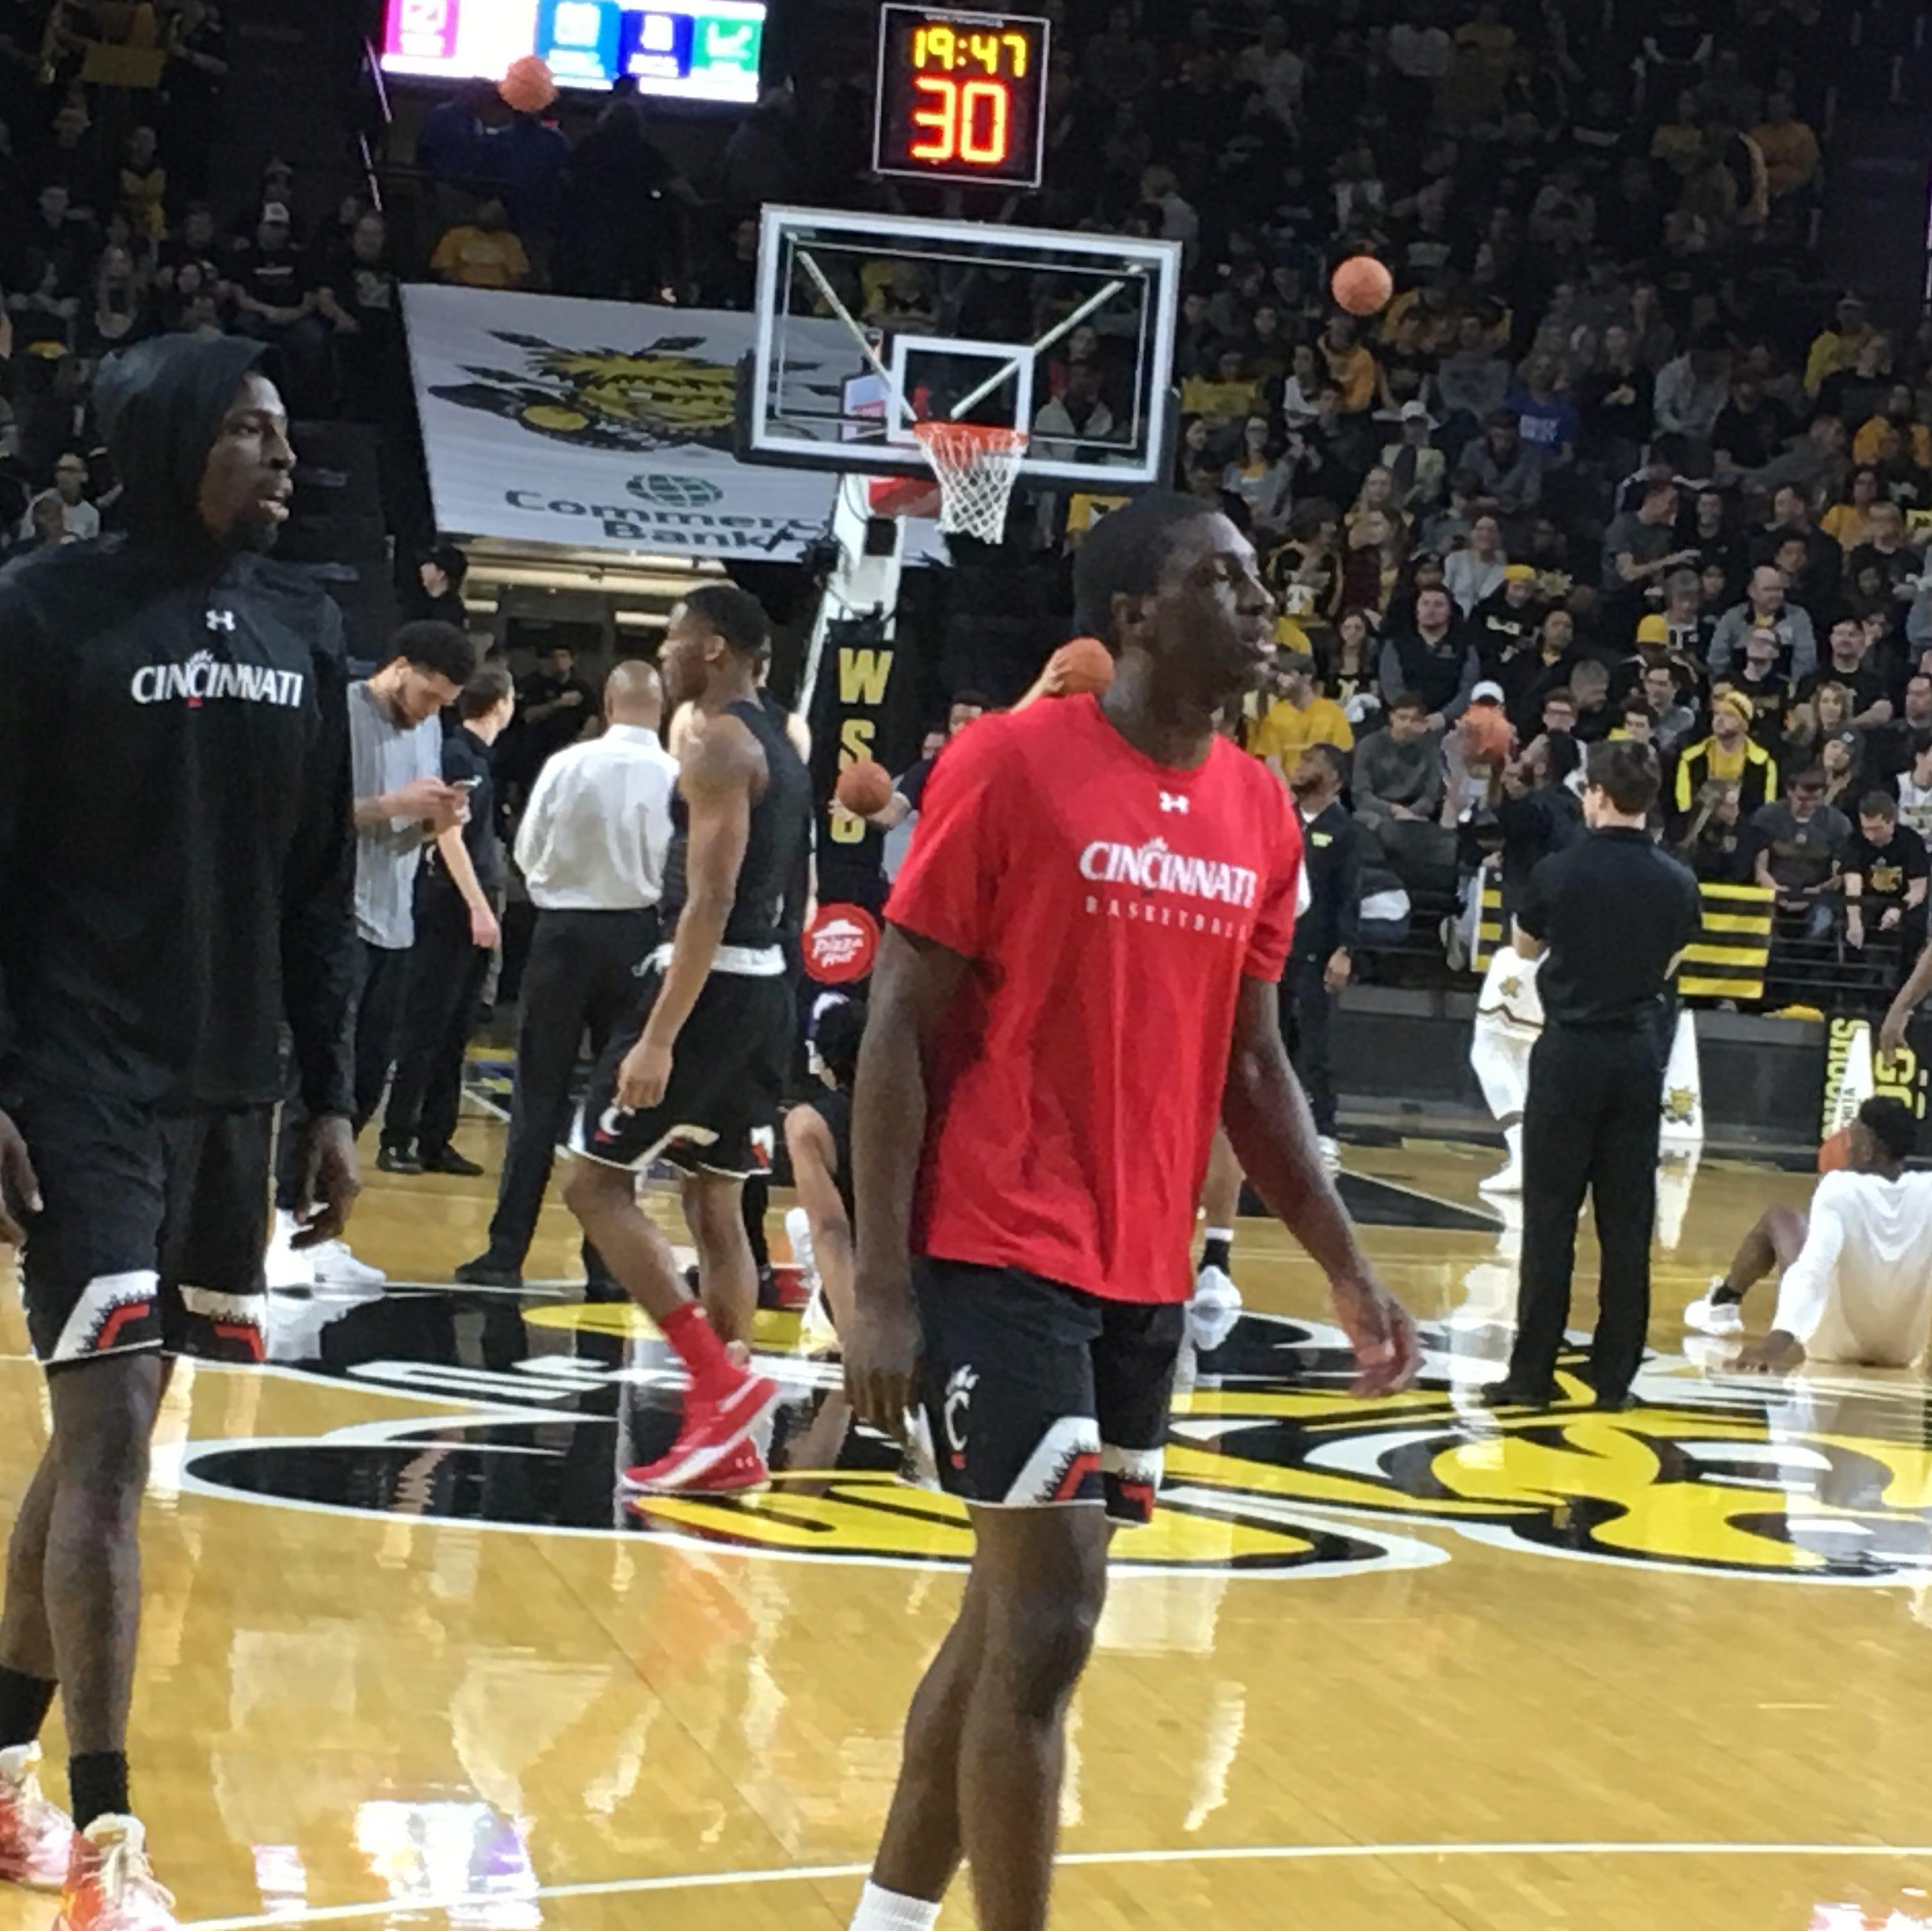 UC pulls away from Wichita State with late run, 66-55